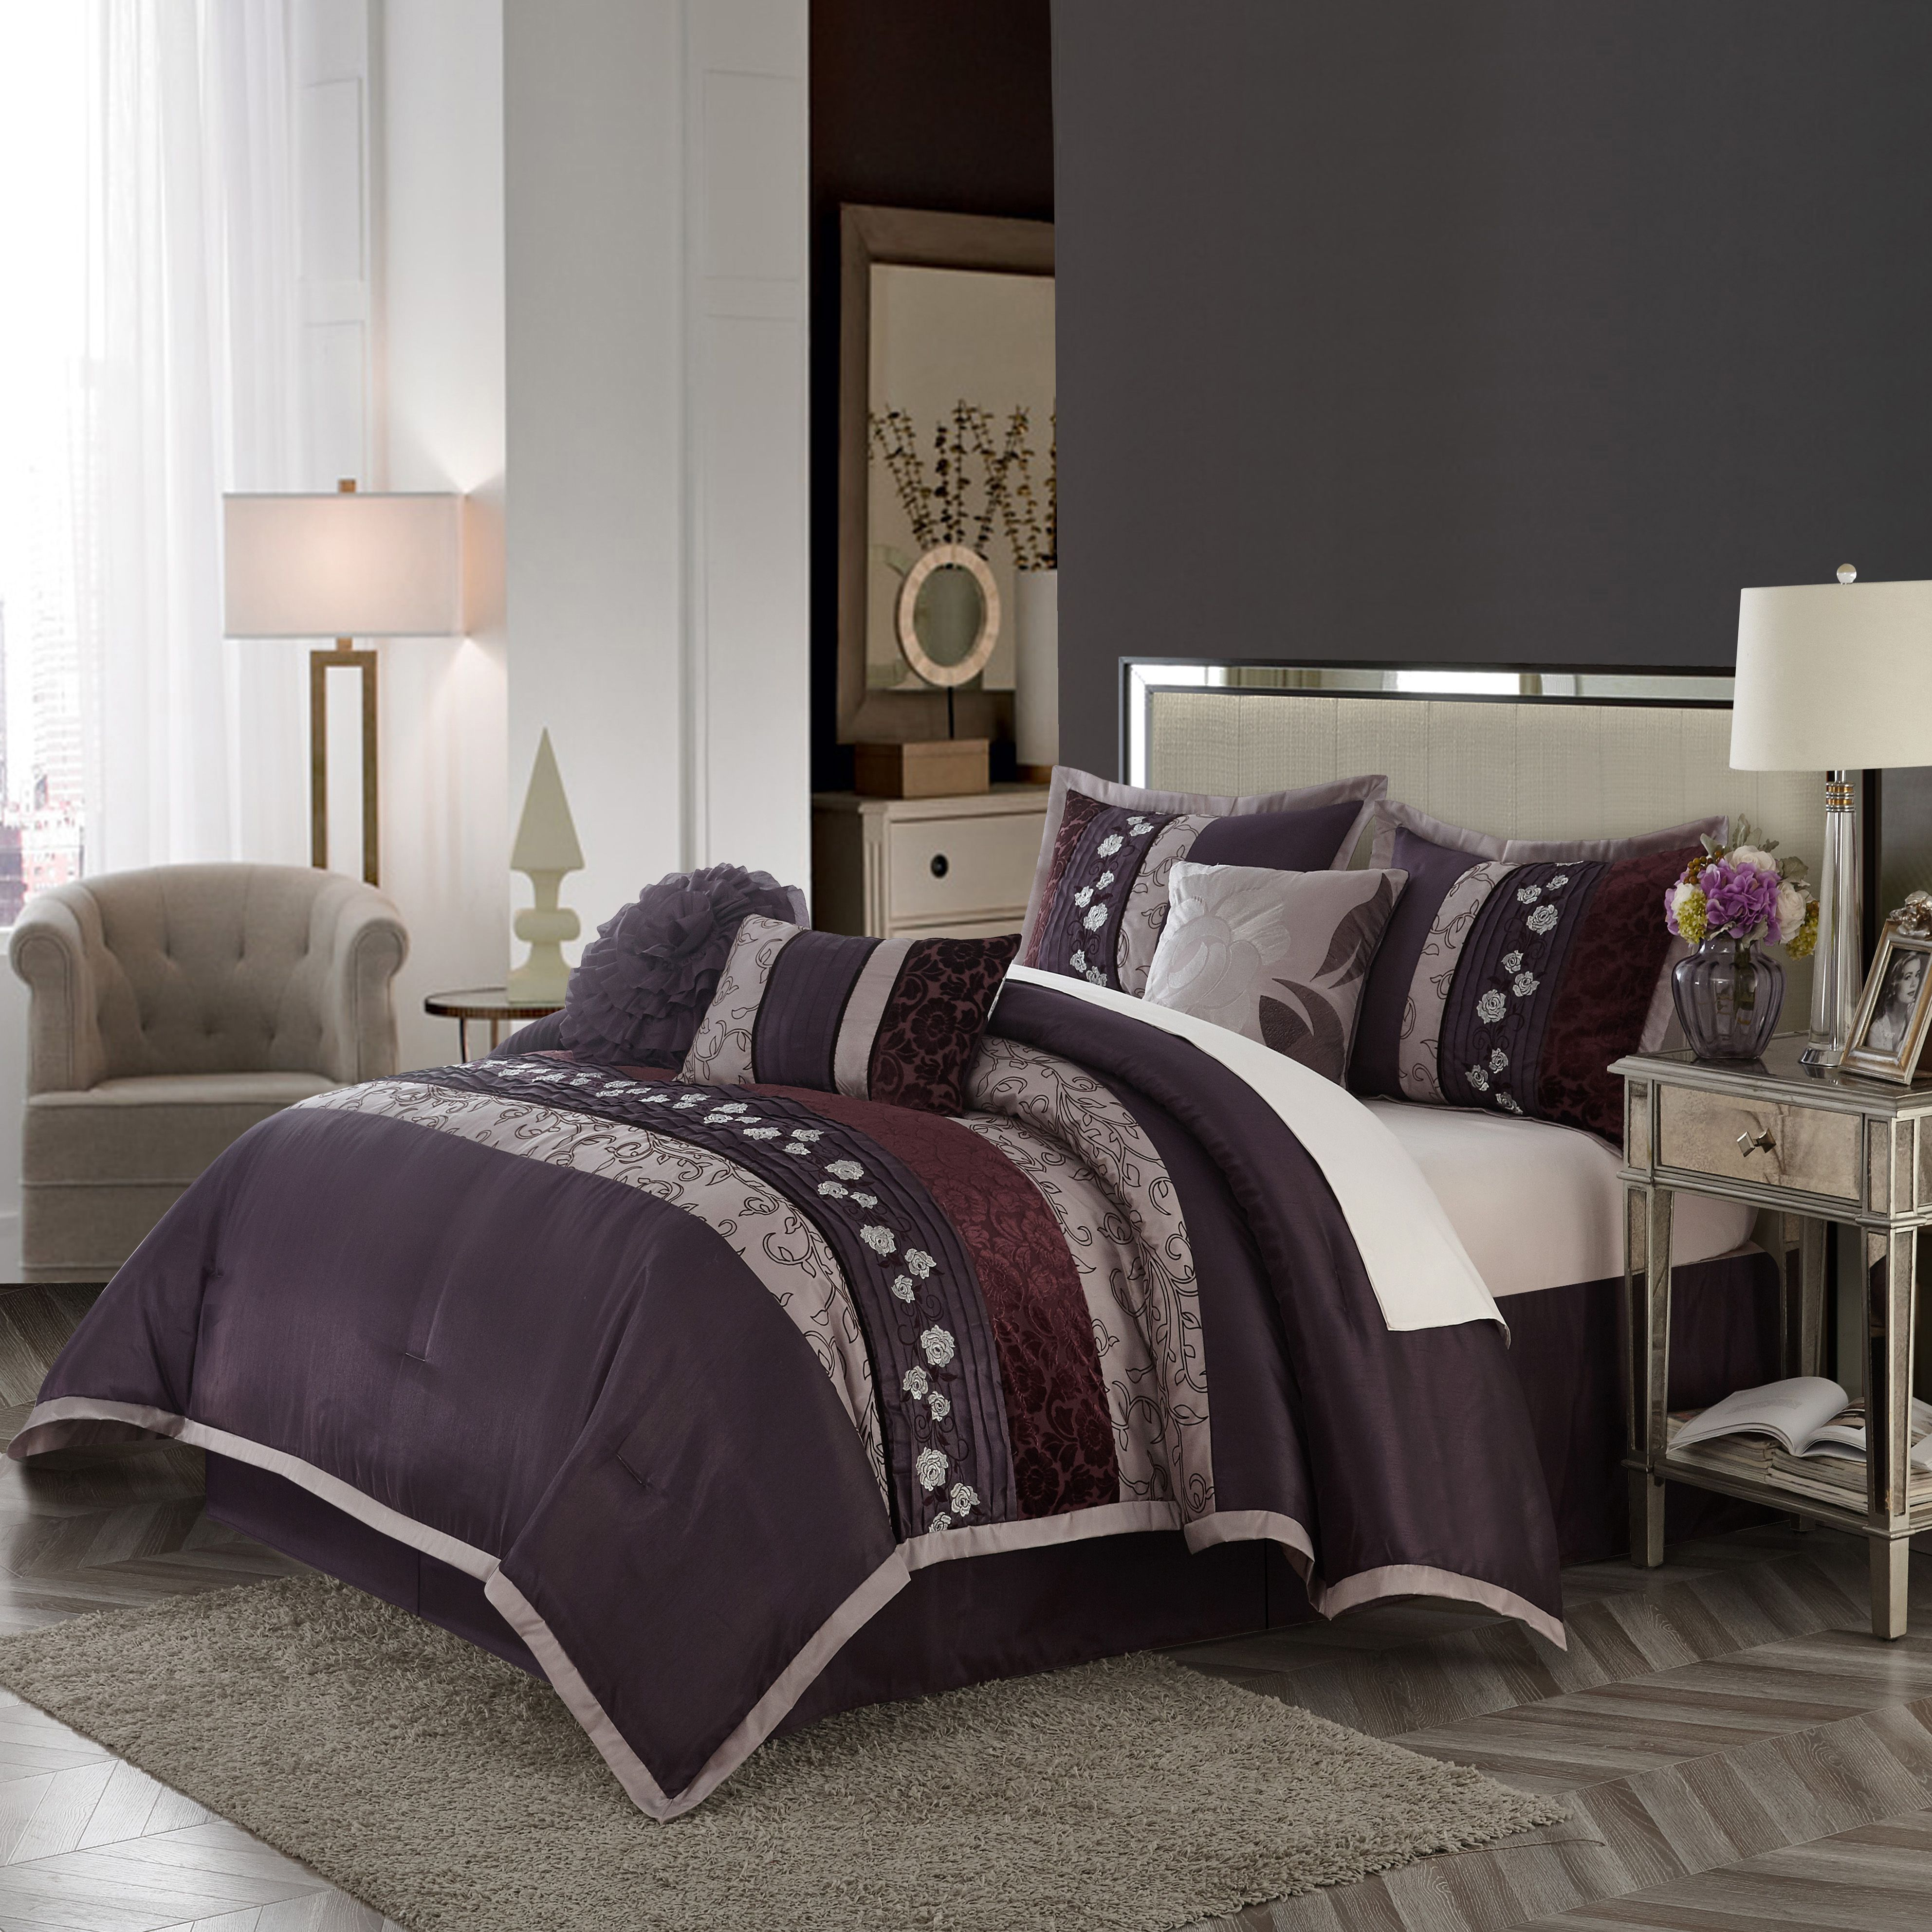 Free 2day shipping. Buy Nanshing Riley 7Piece Comforter